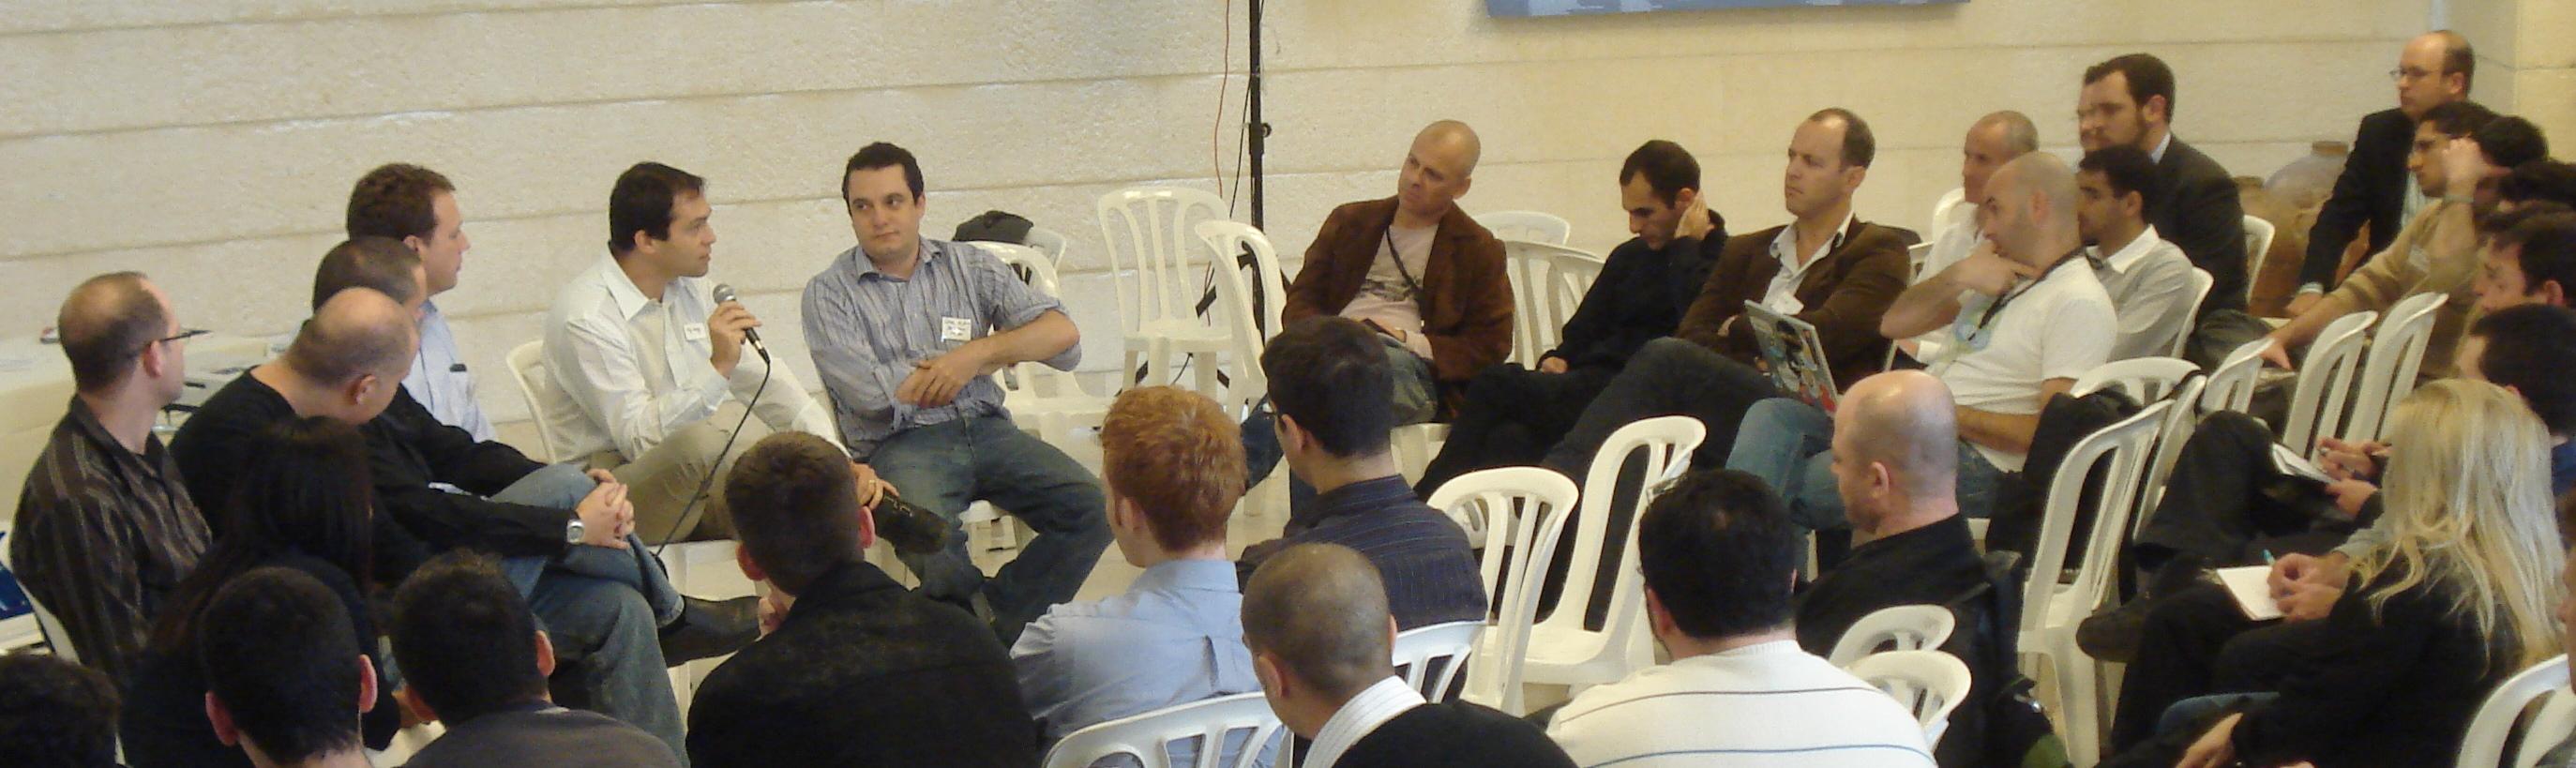 Seedcamp Tel Aviv Panel Discussion '09